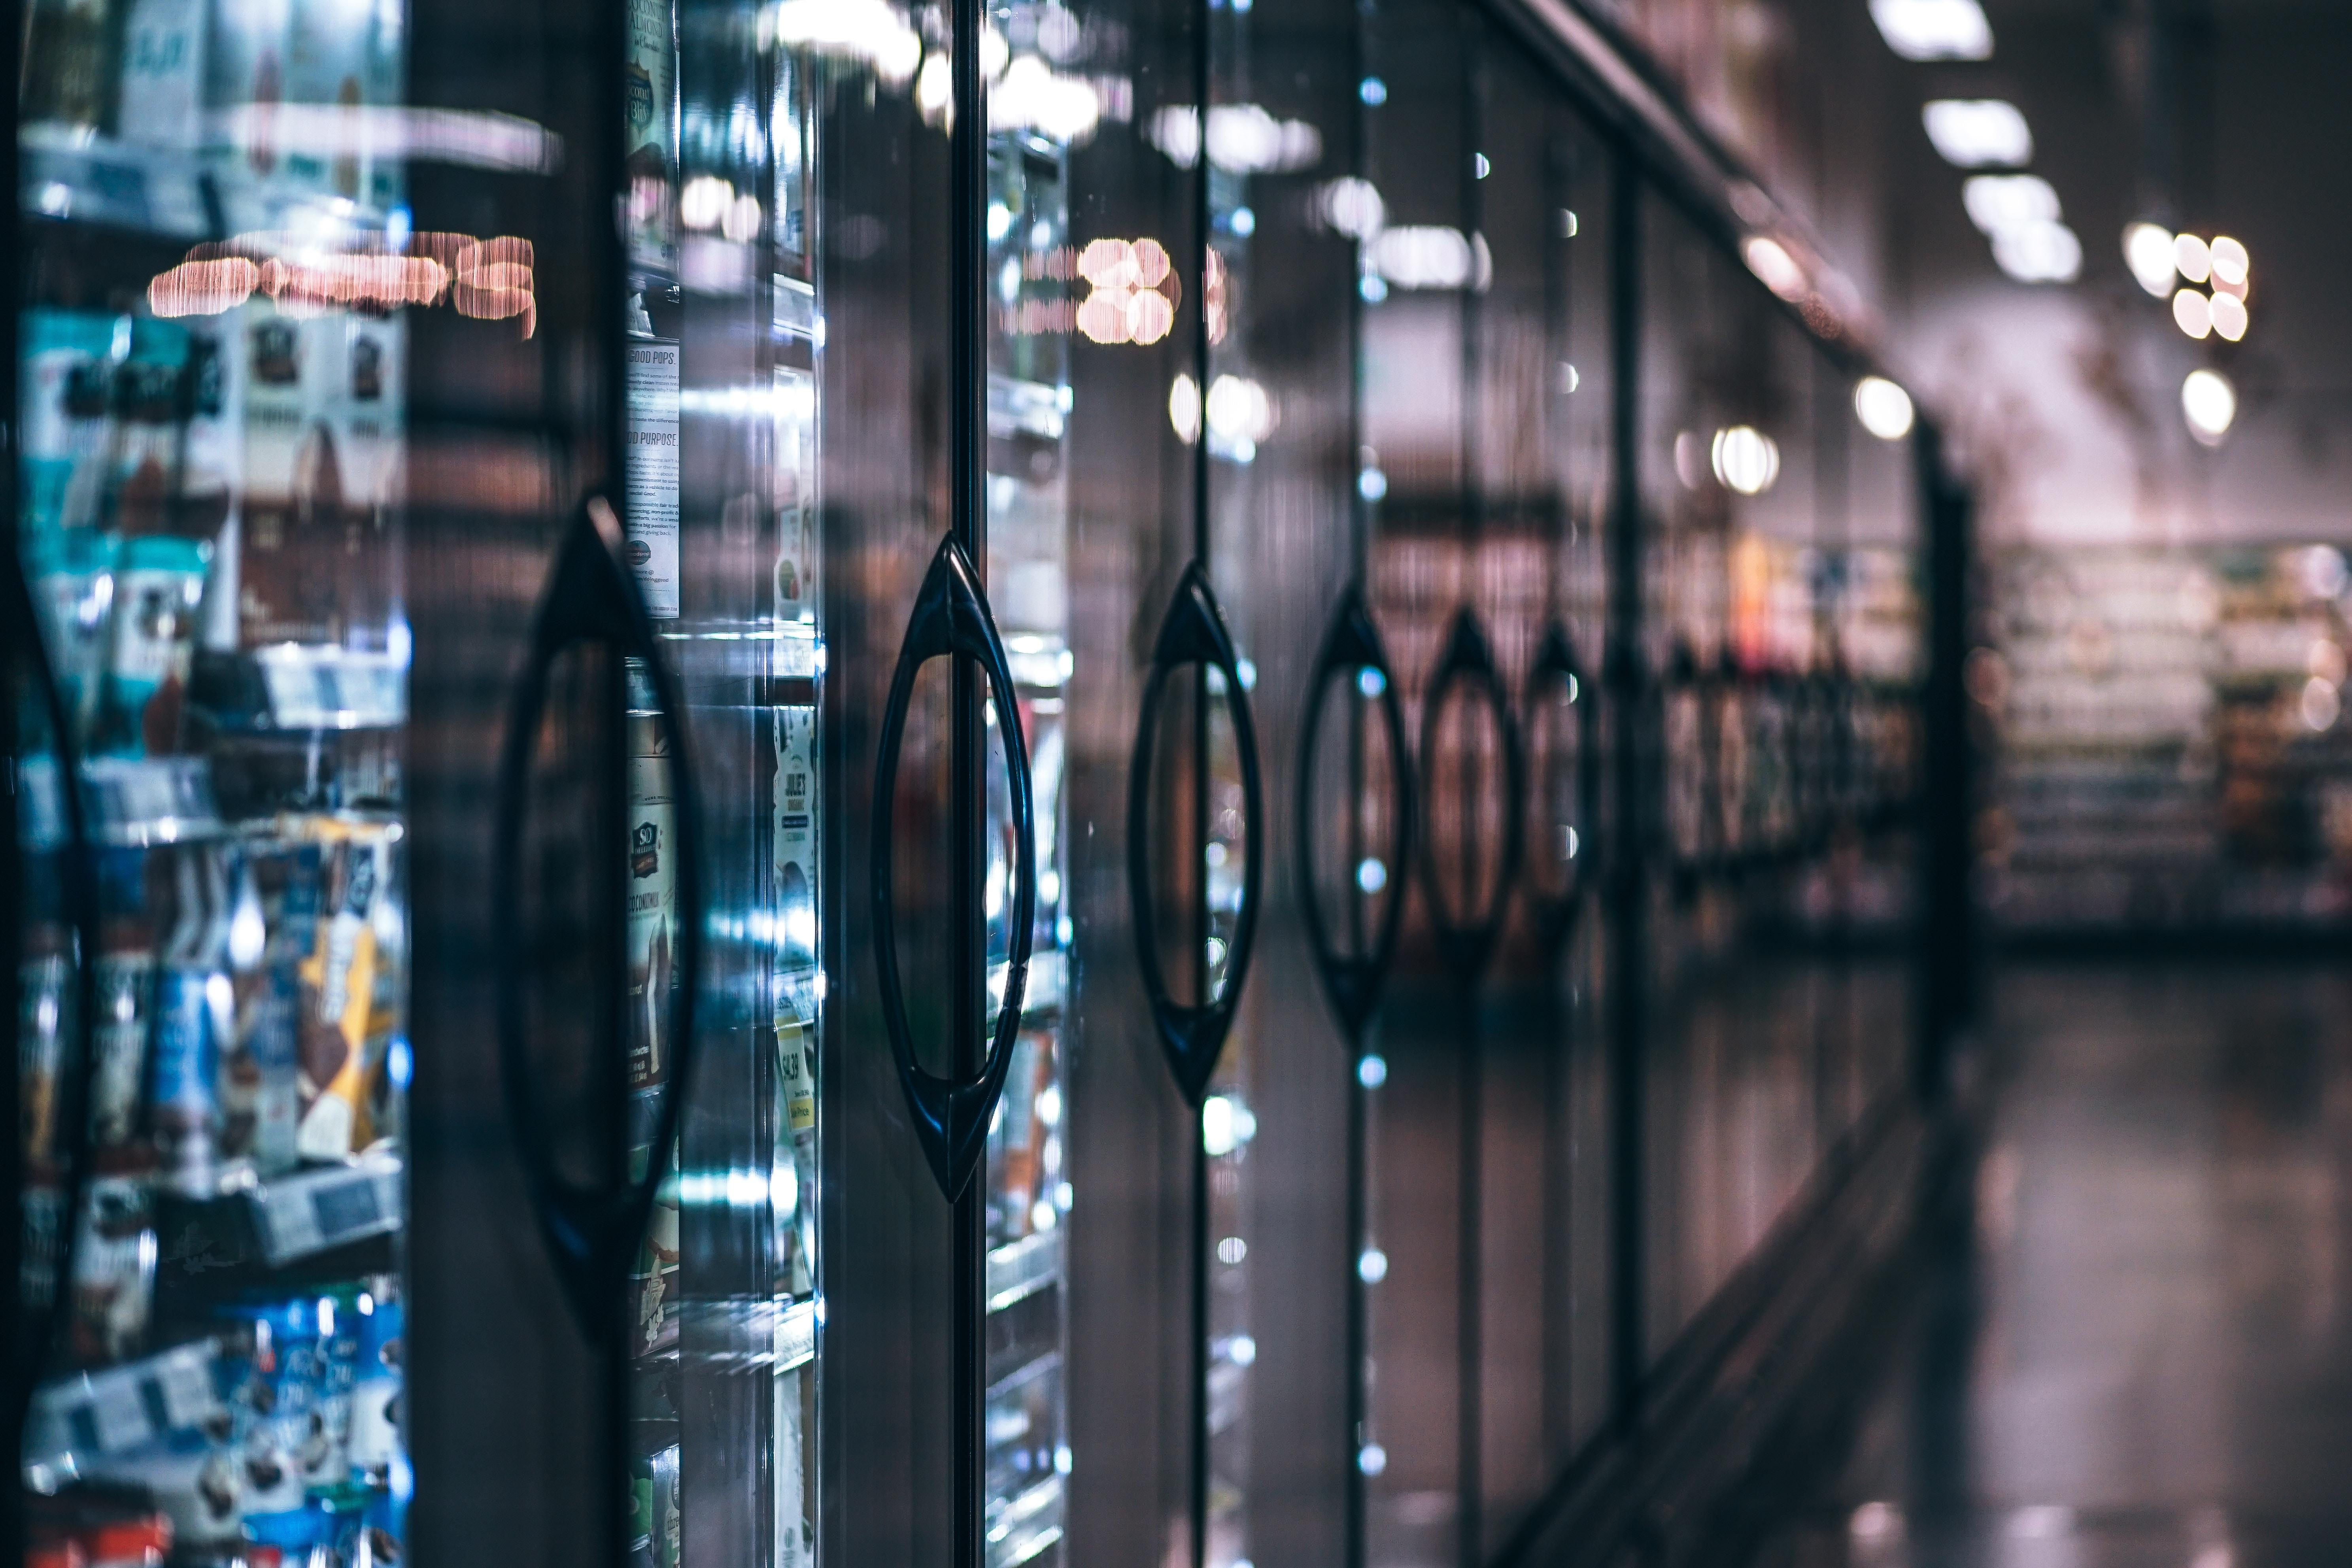 Supermarket refrigerators photo